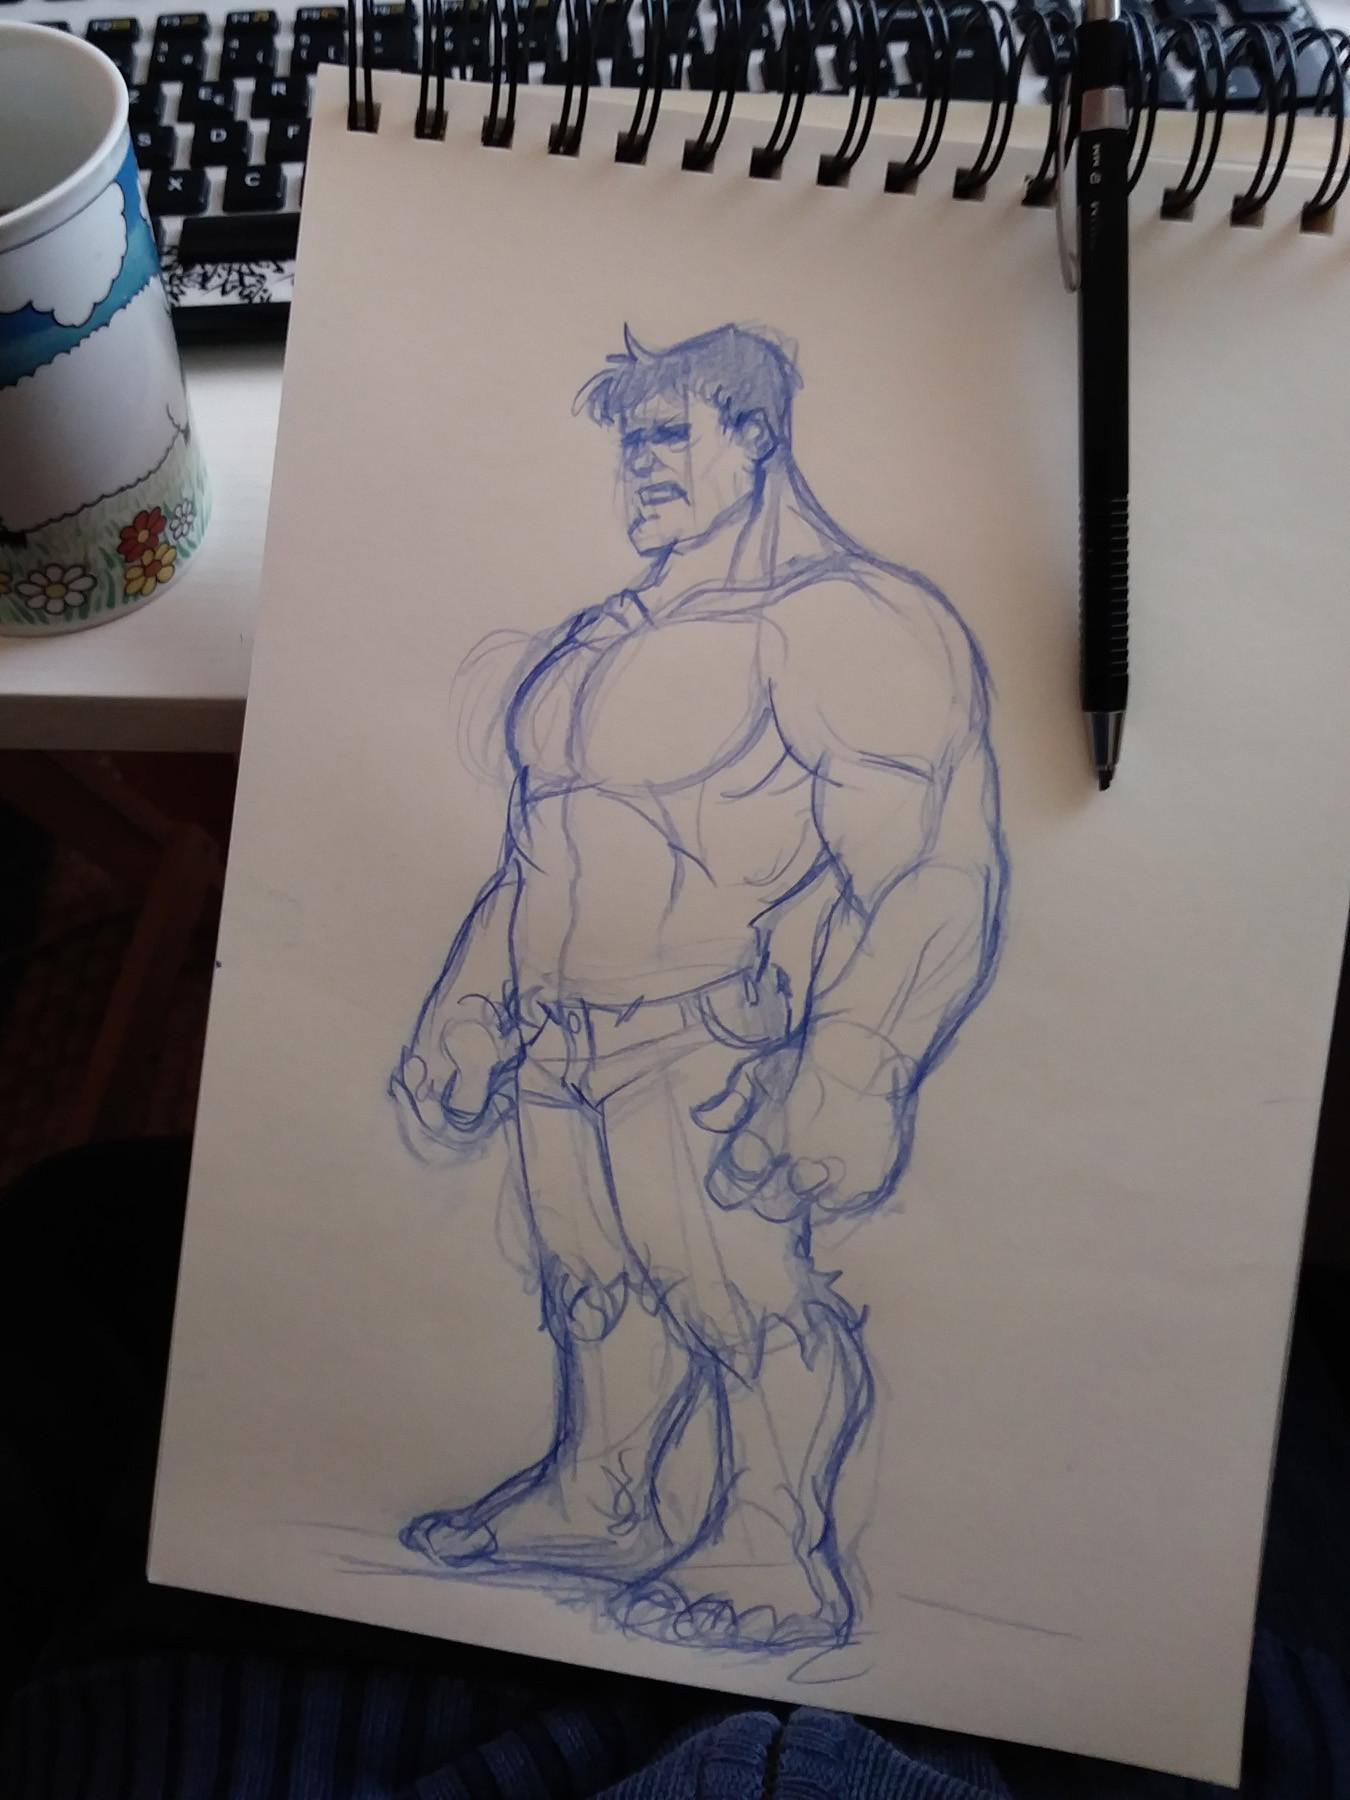 Serge fiedos hulk fullbody sketch by serge fiedos